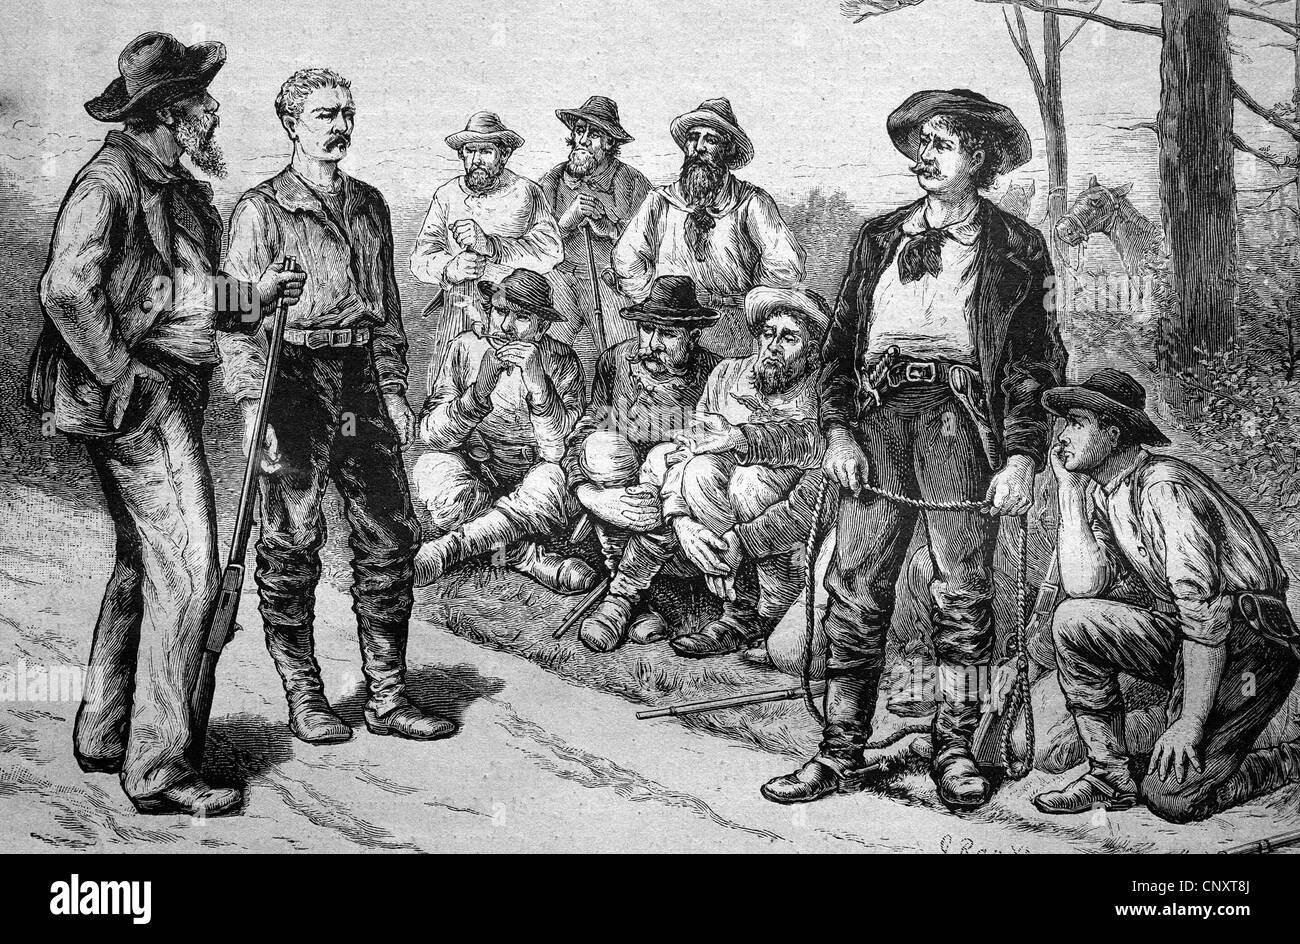 Lynching court, Texas, USA, historical engraving, 1888 - Stock Image